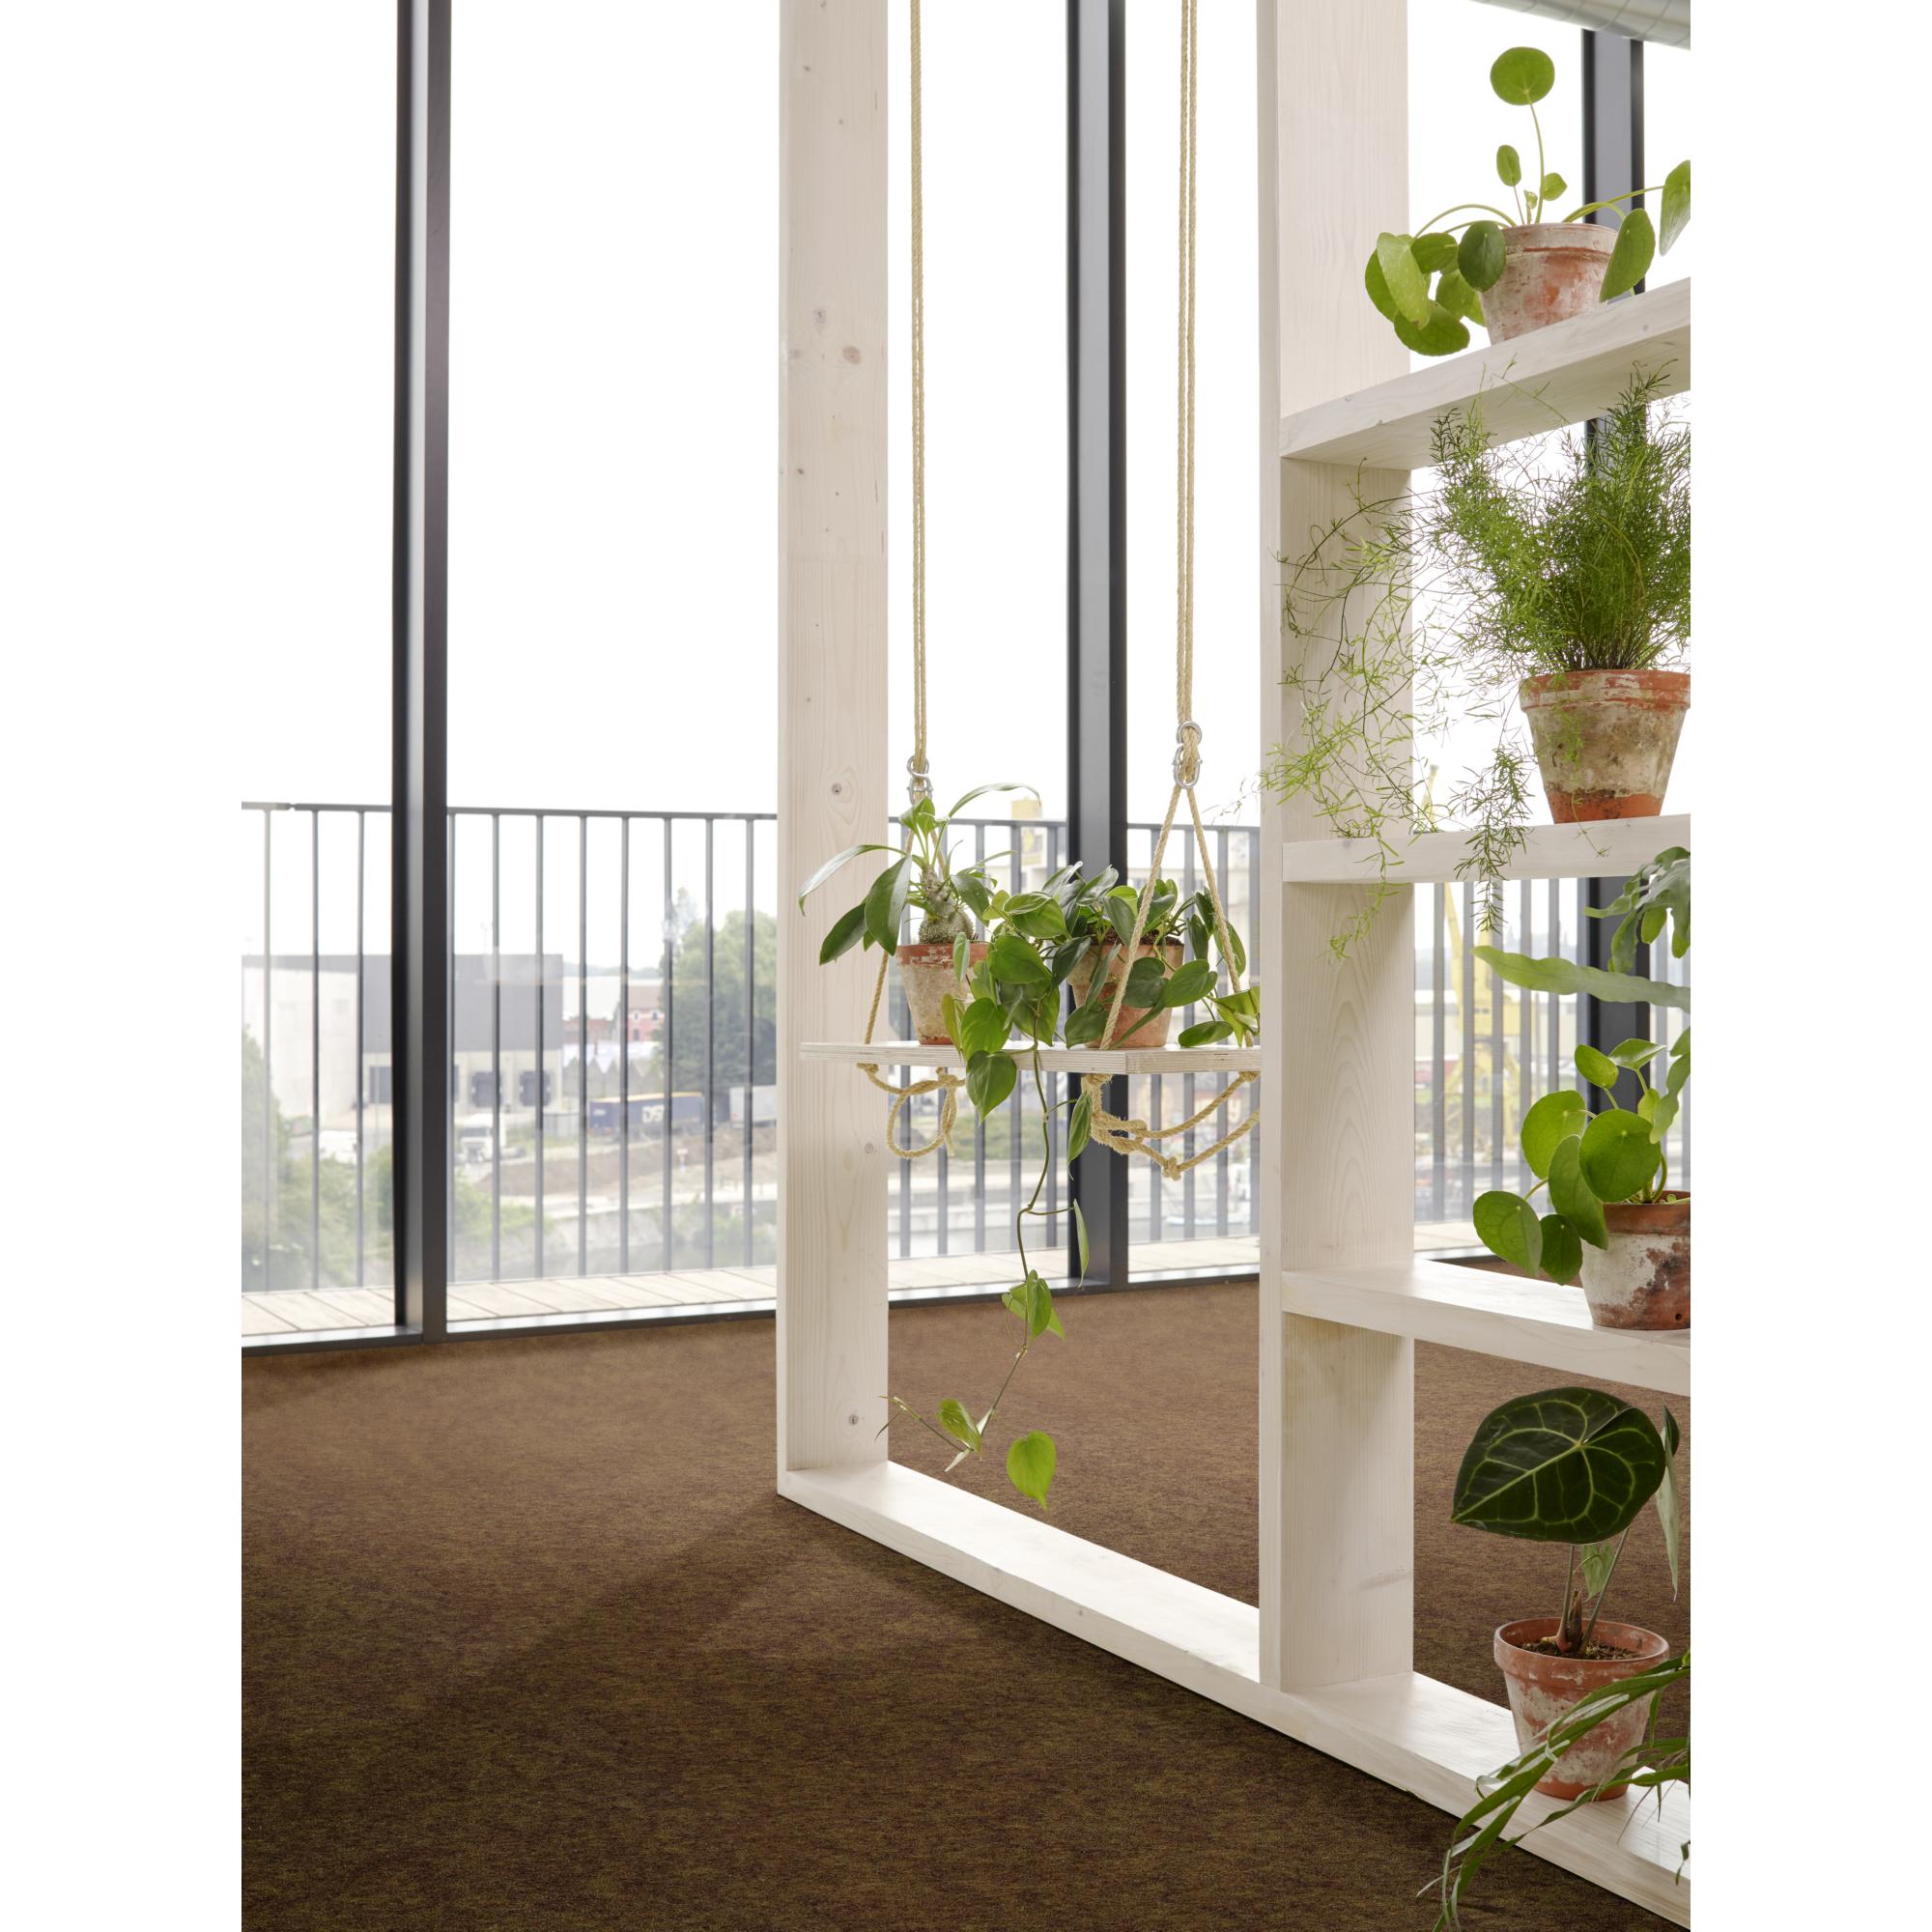 Rasenteppich Kunstrasen Comfort dunkel braun 400x430 cm